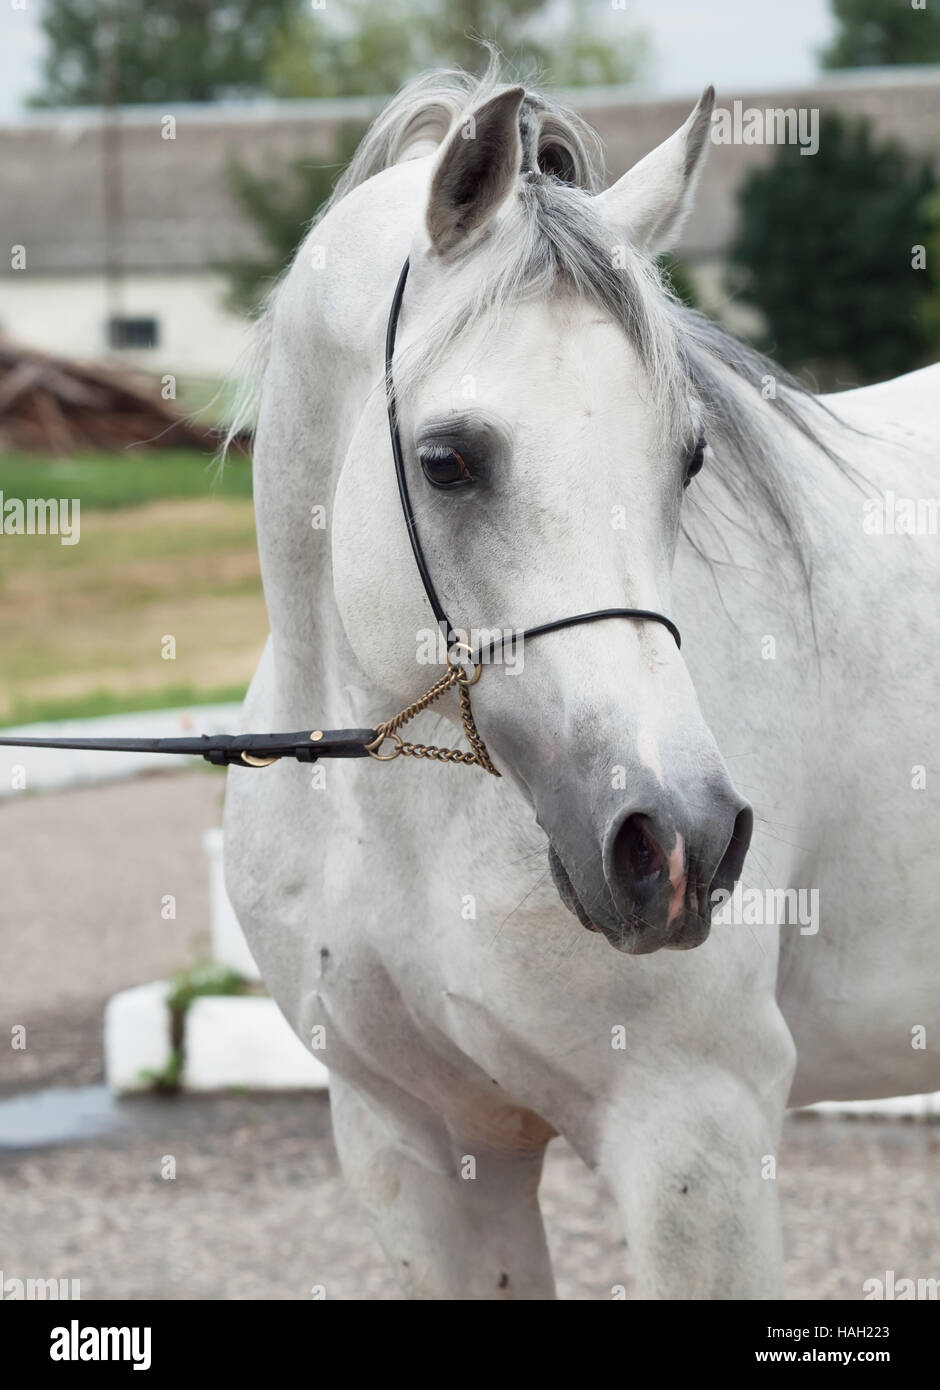 Retrato de blanco Arabian Horse. cerrar Imagen De Stock